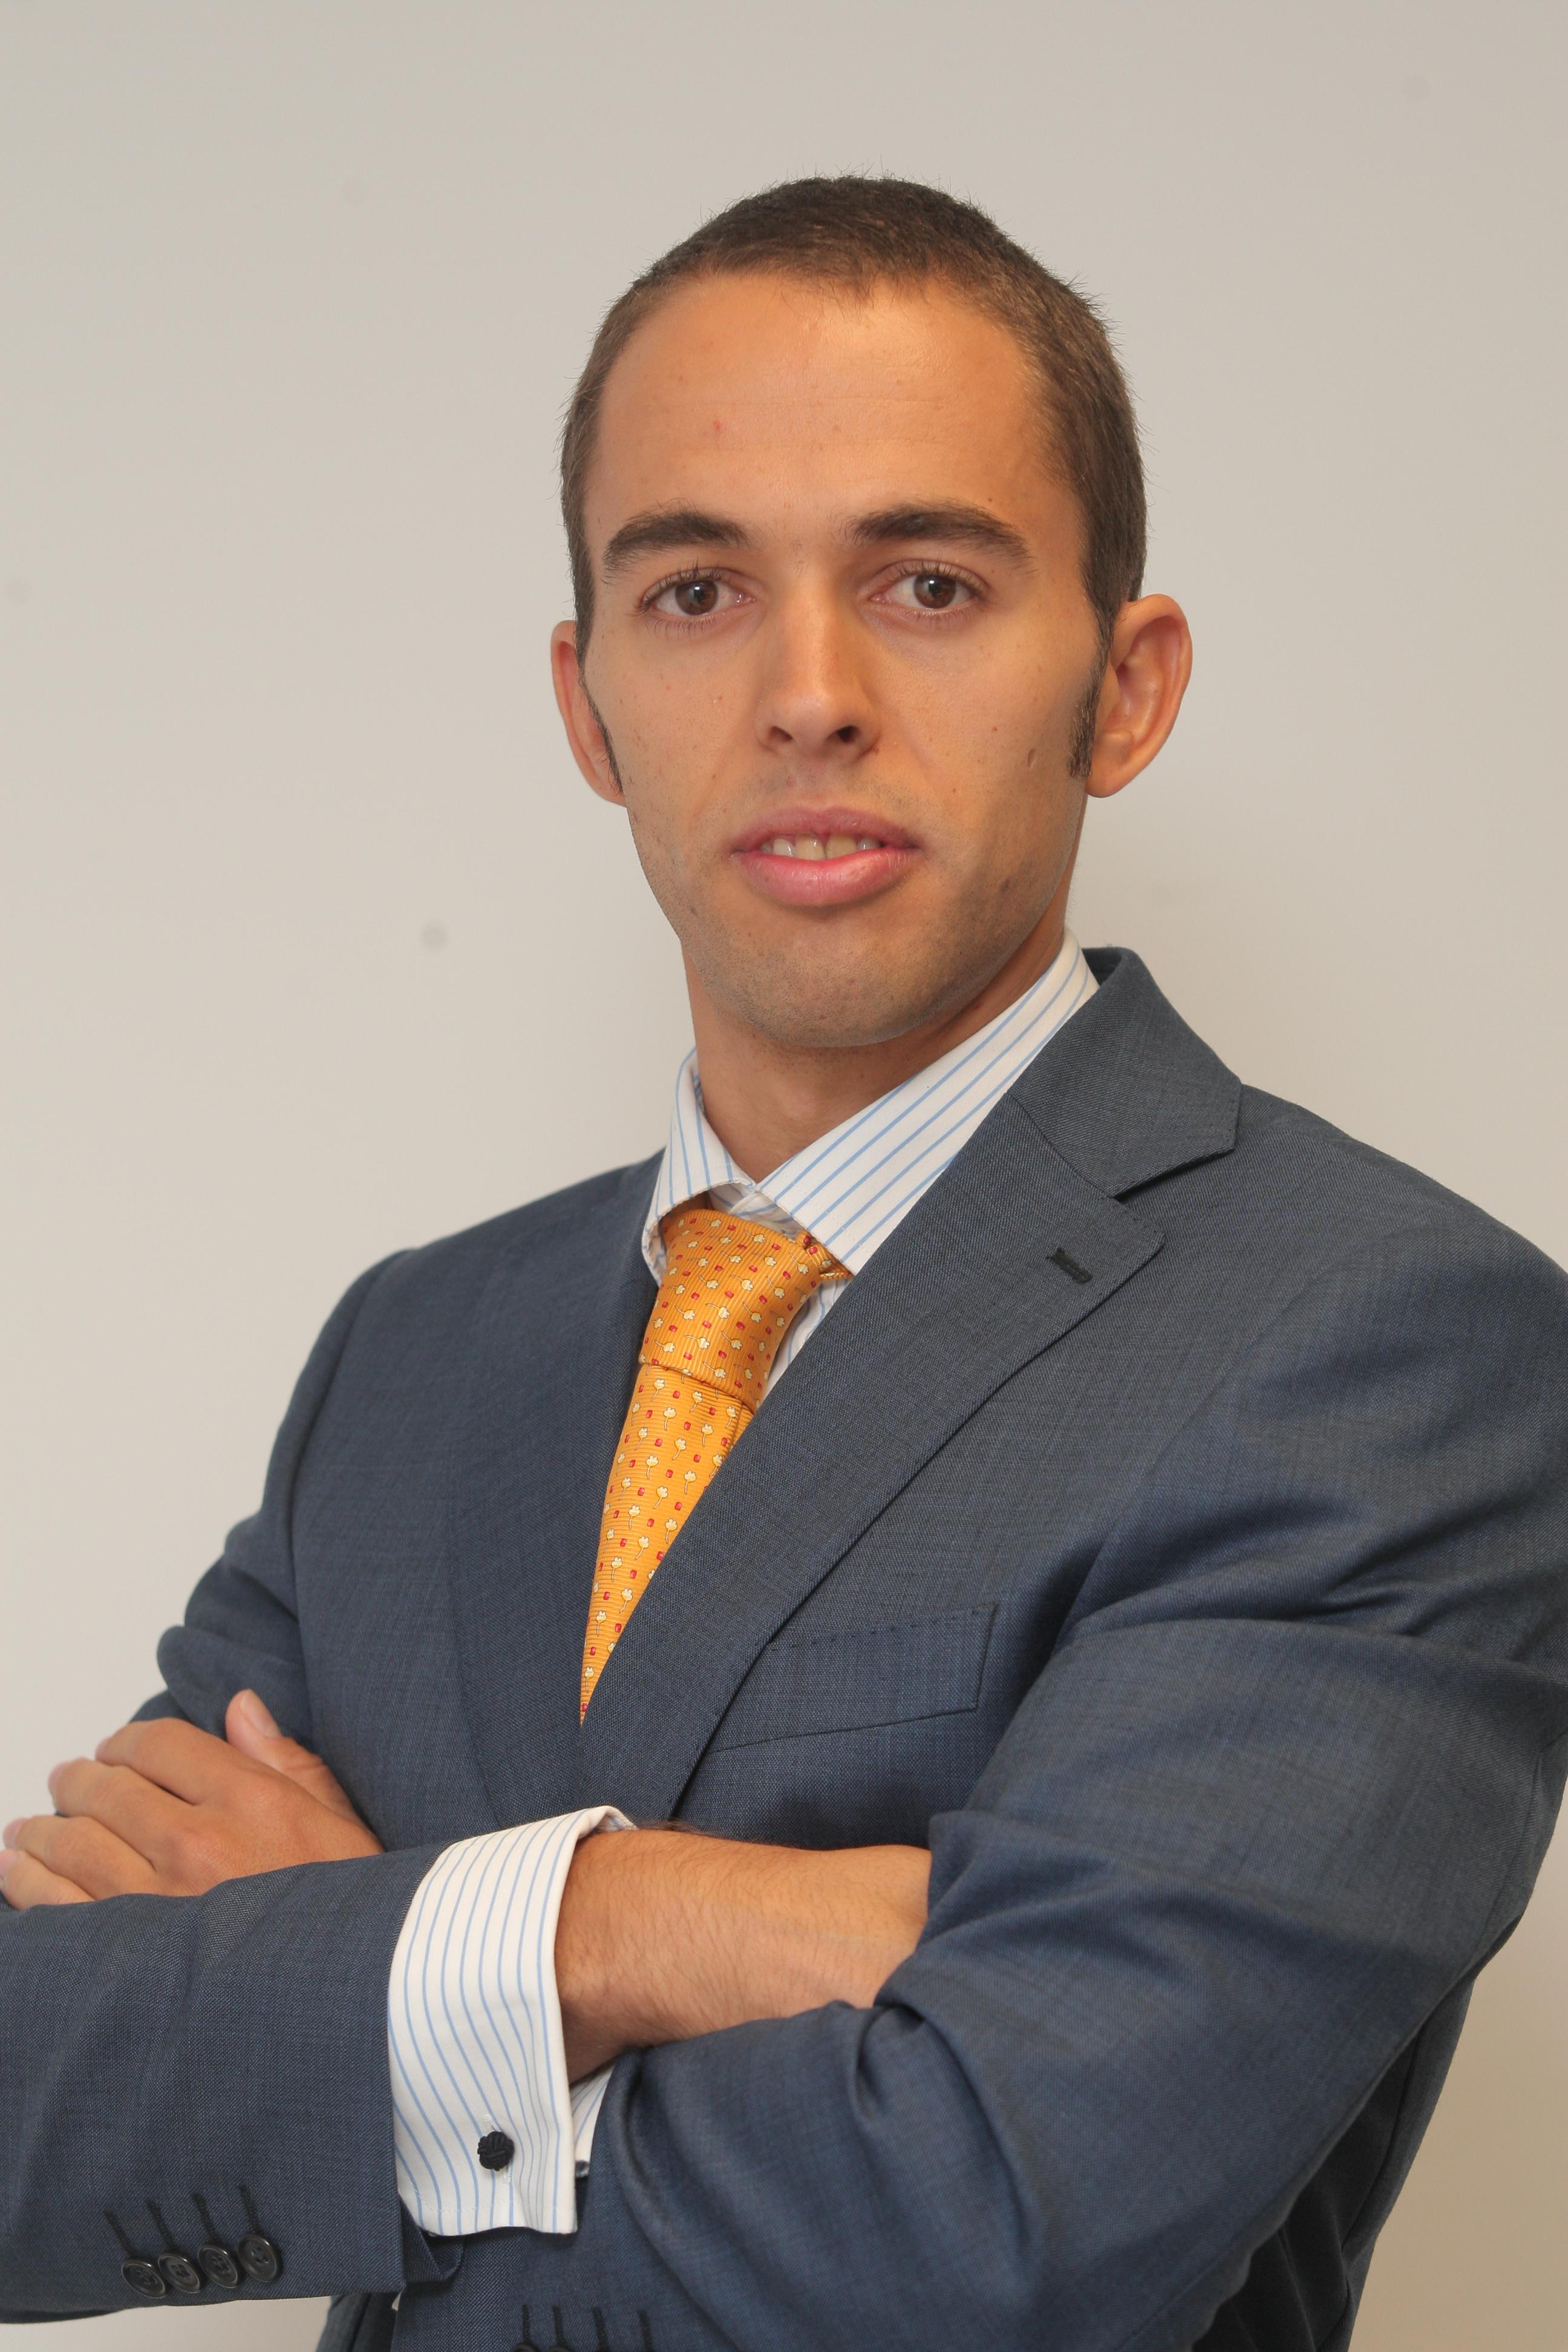 Ignacio Ahumada Navarro abogado